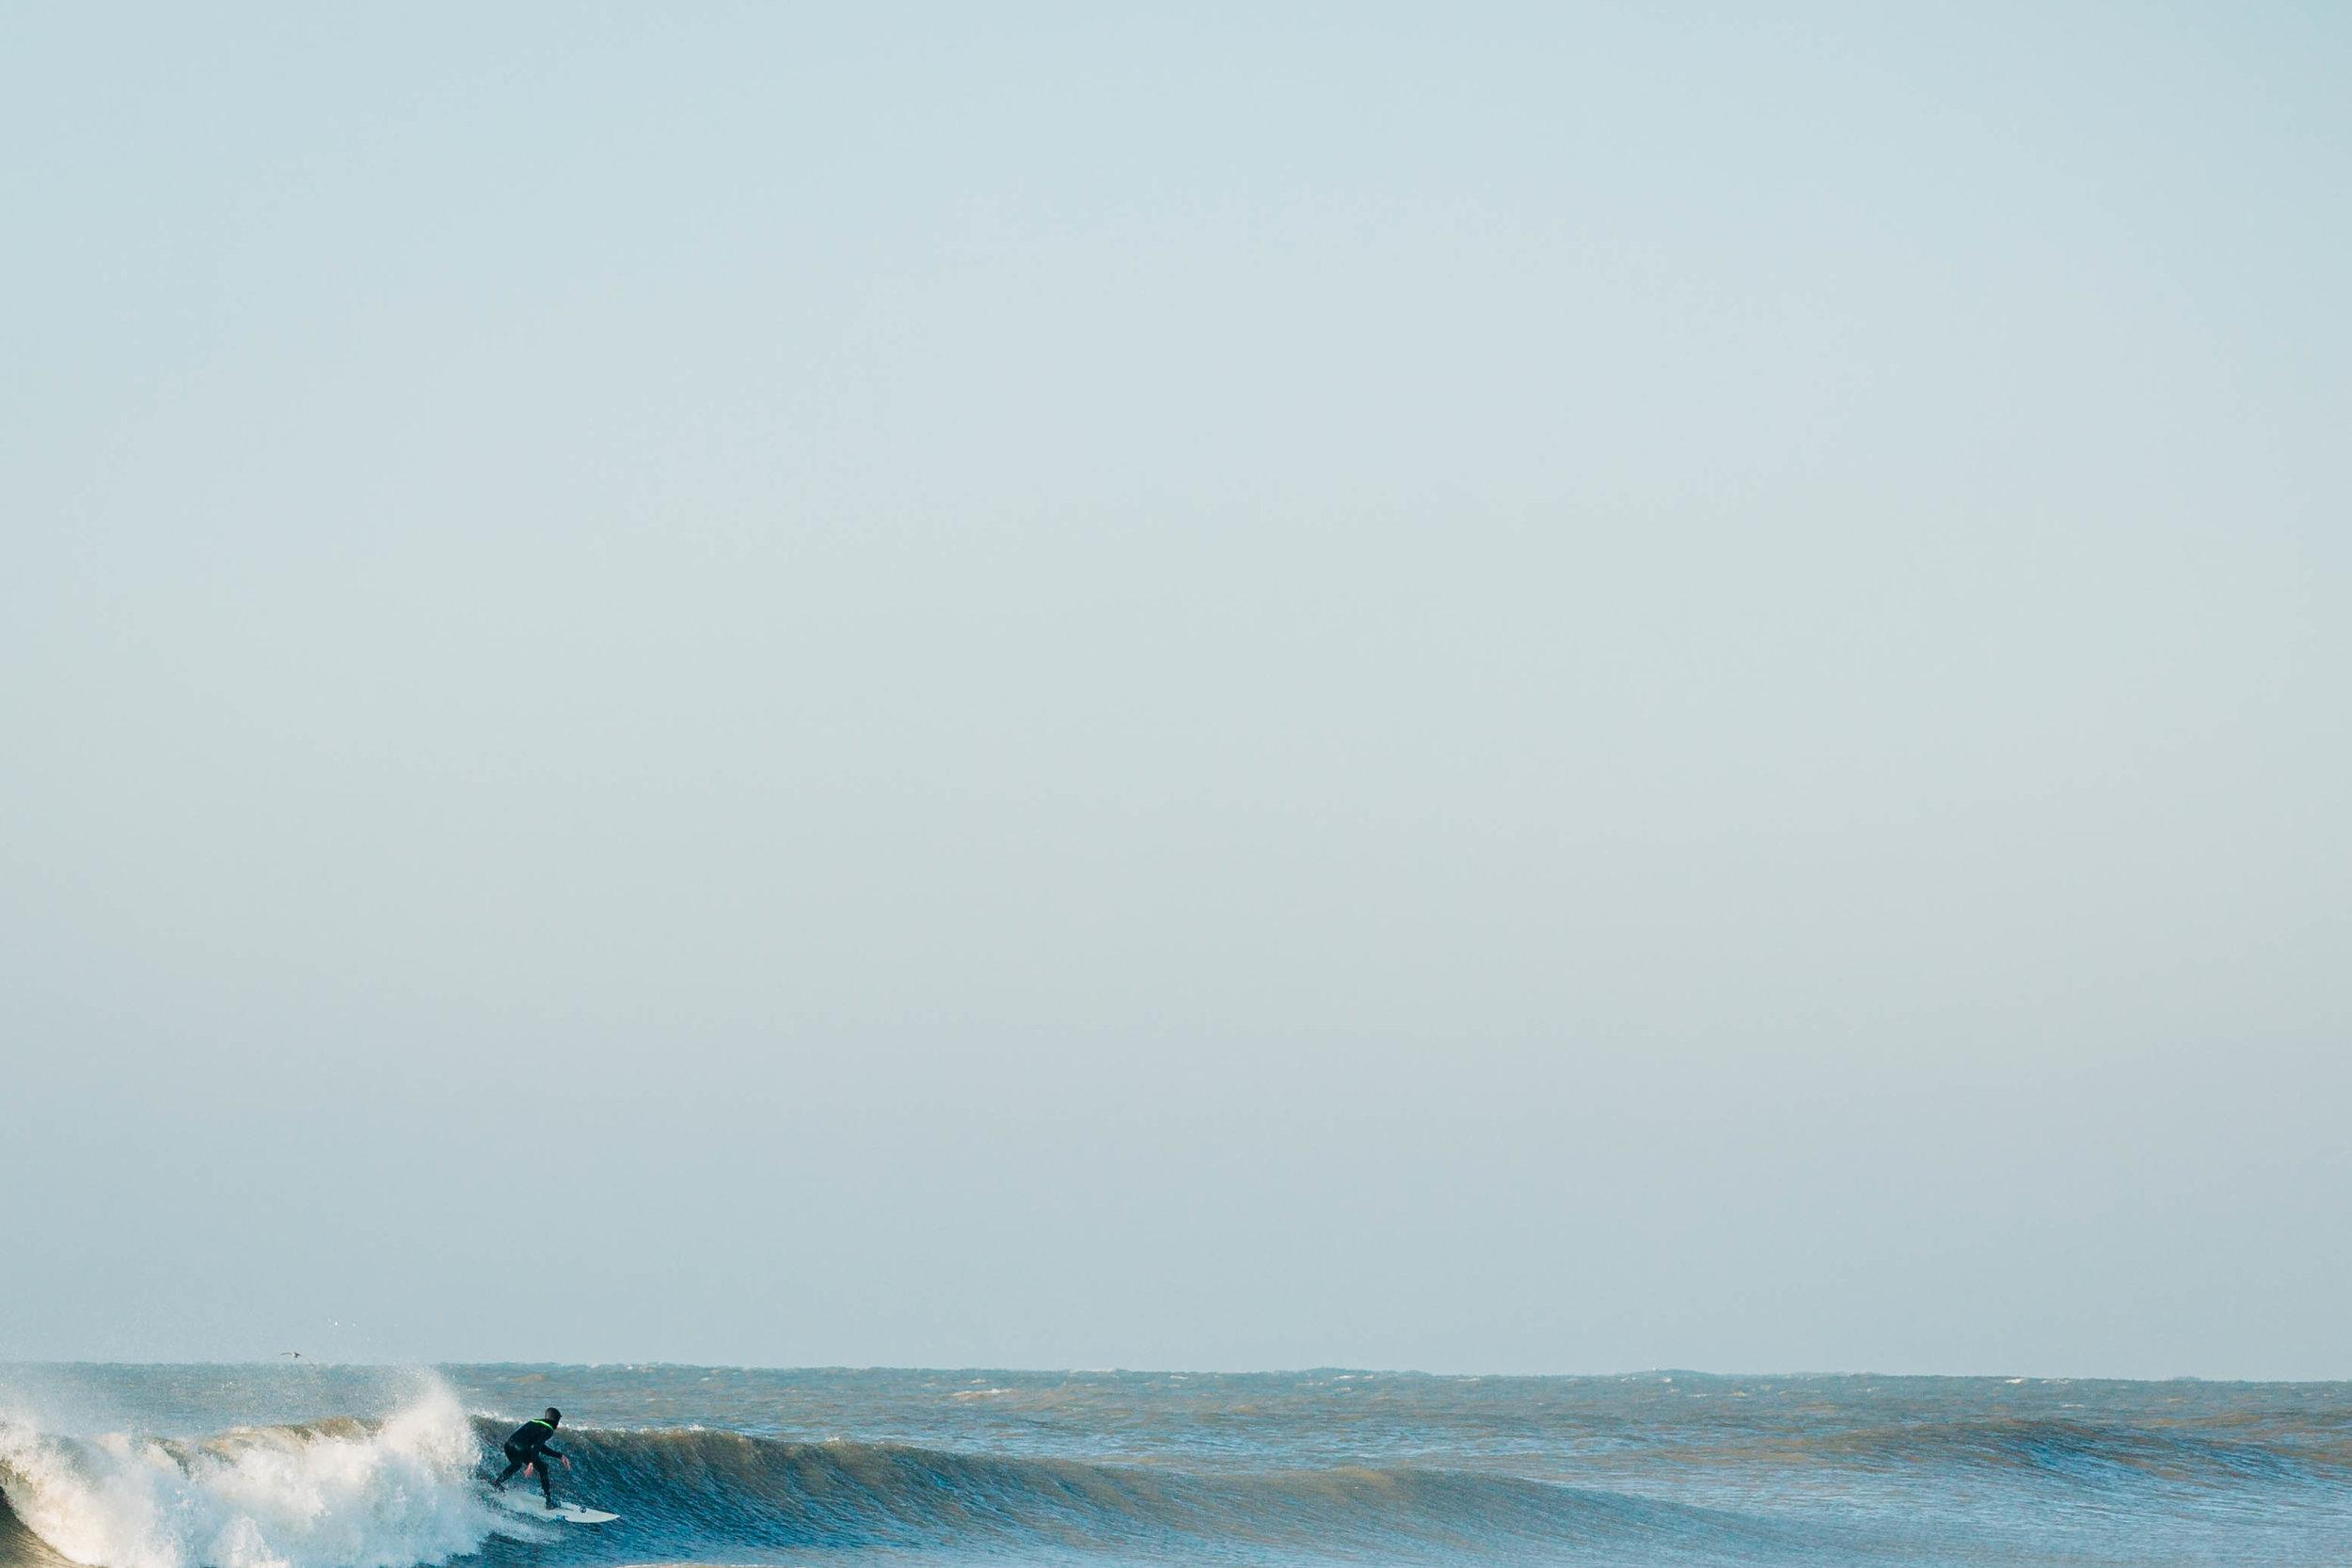 Alex_Sedgmond_Photography-Cardiff-SouthWales-PorthcawlRestbay-Surfing-EzraHames-29.jpg